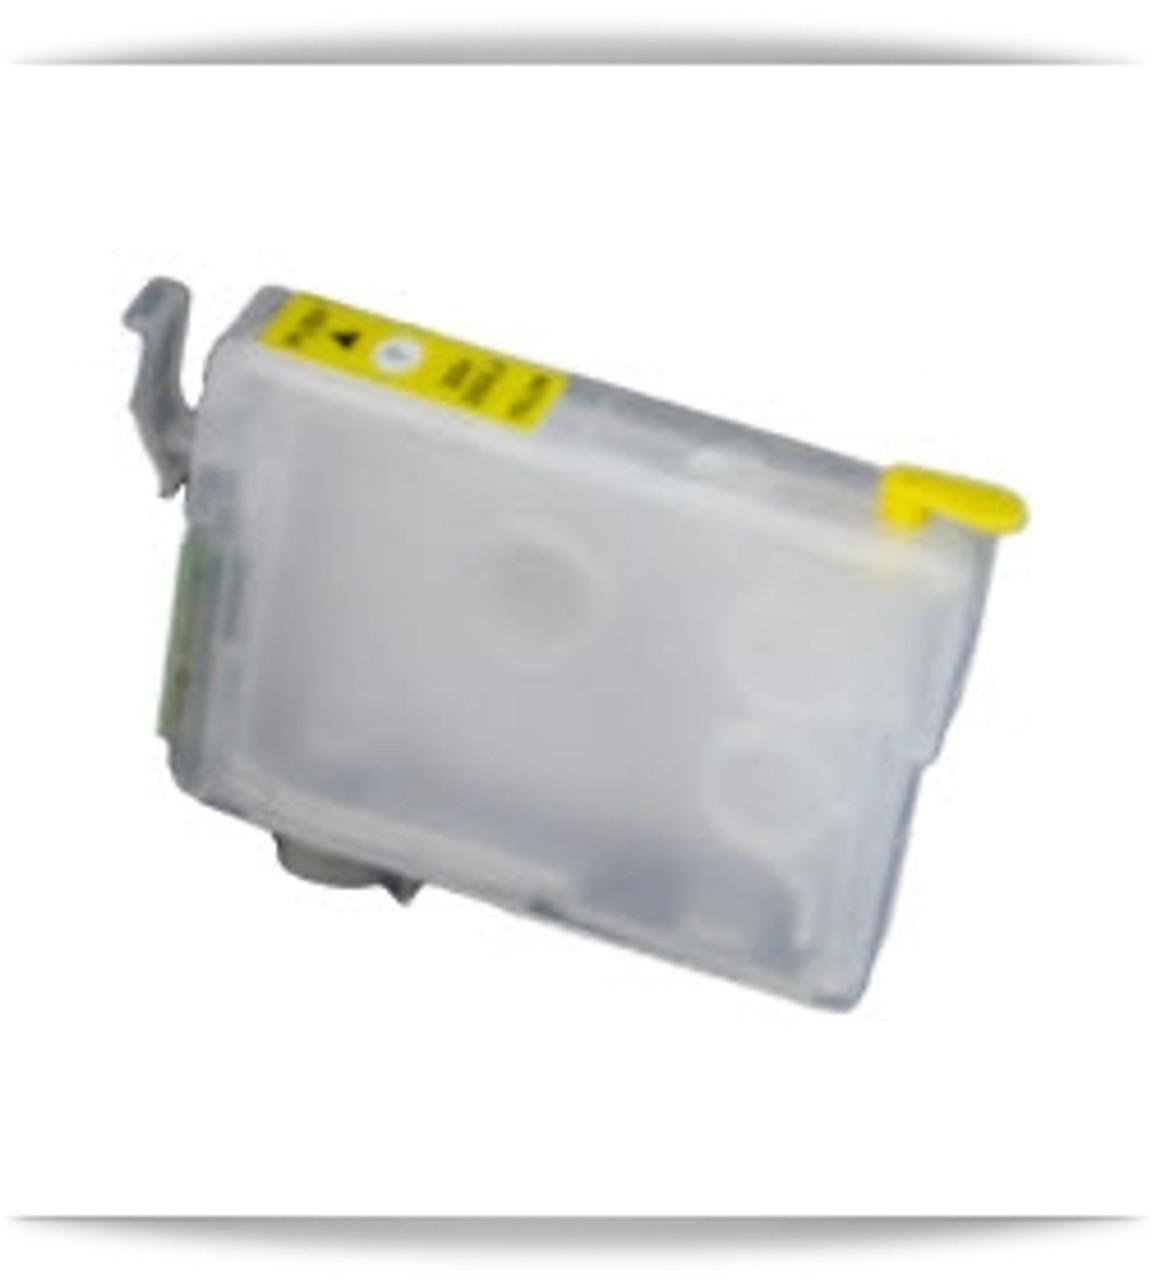 Yellow Refillable Epson Expression Home XP, WorkForce WF printer ink cartridge